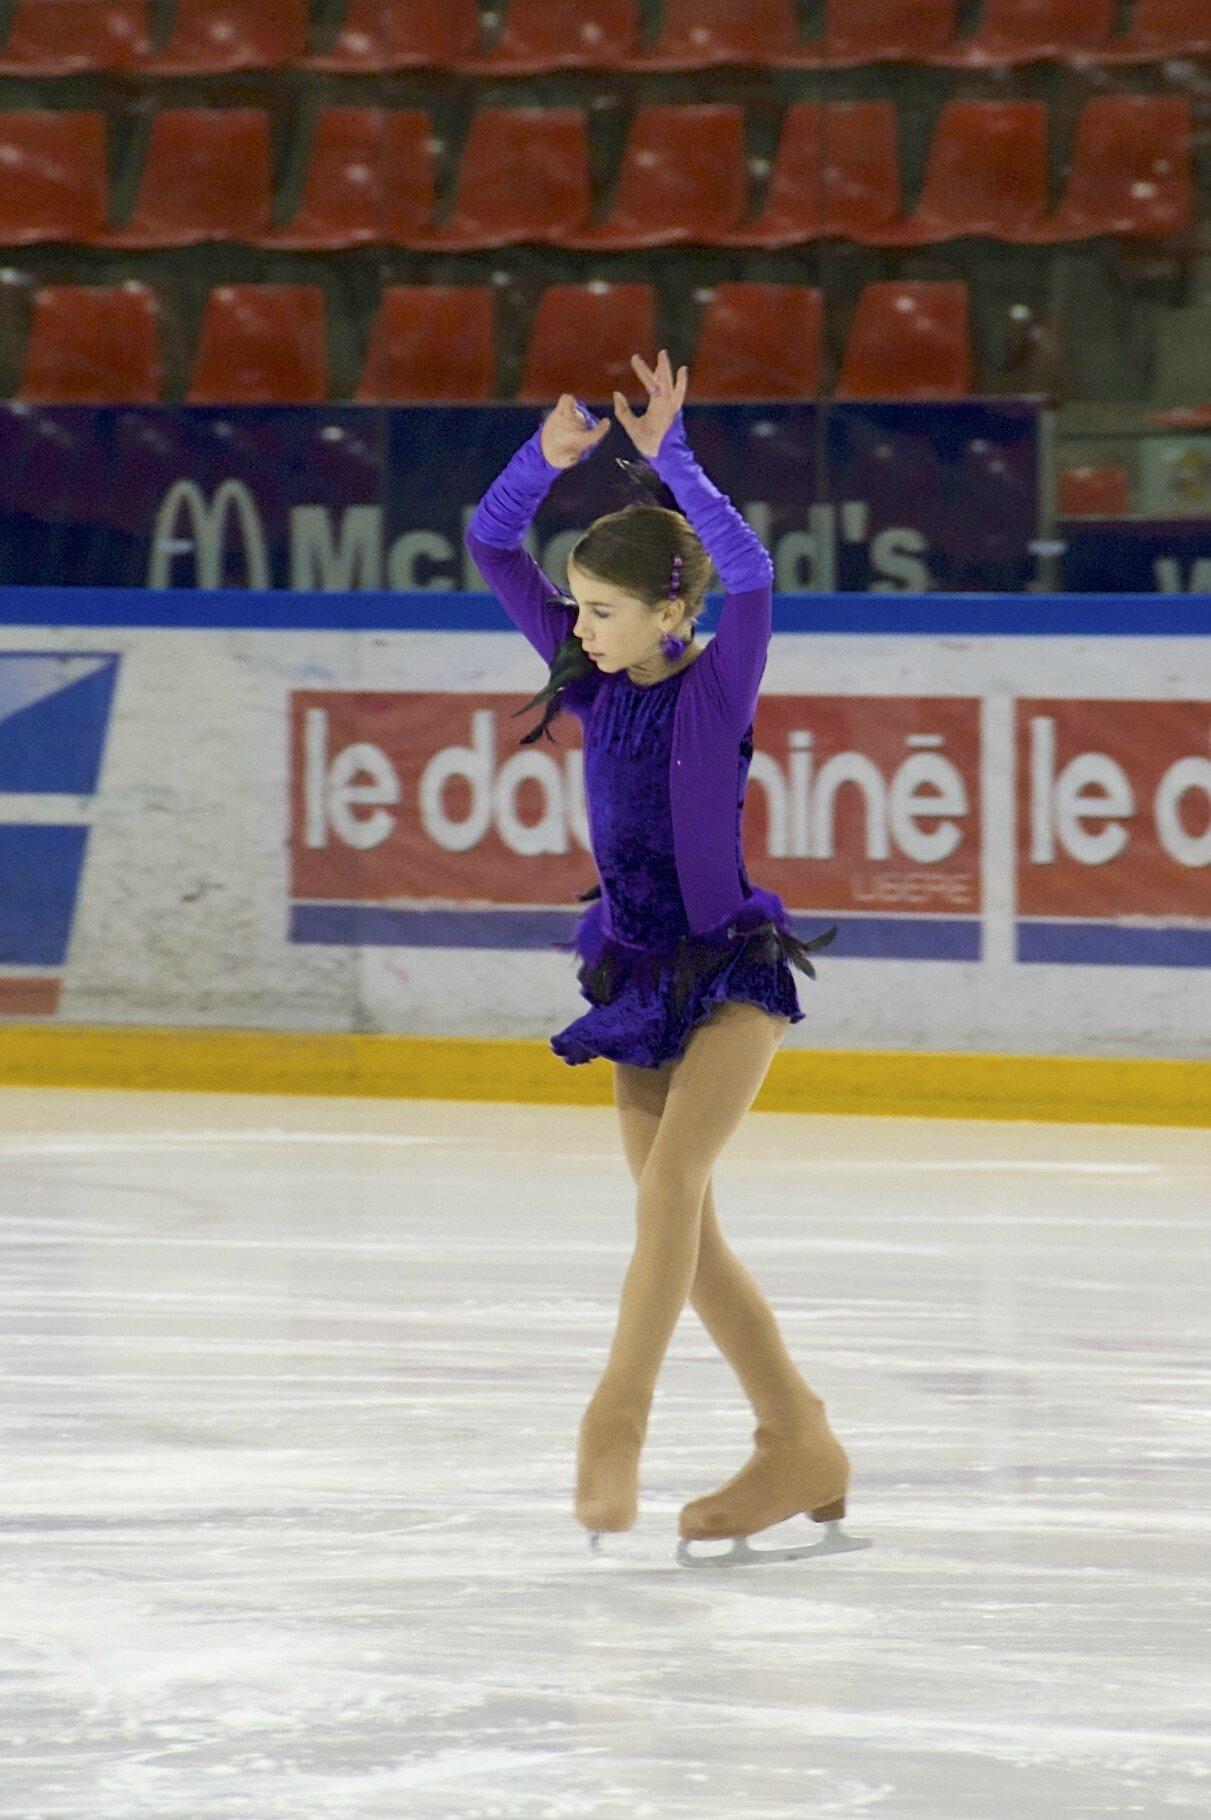 compet Patin Grenoble - 62